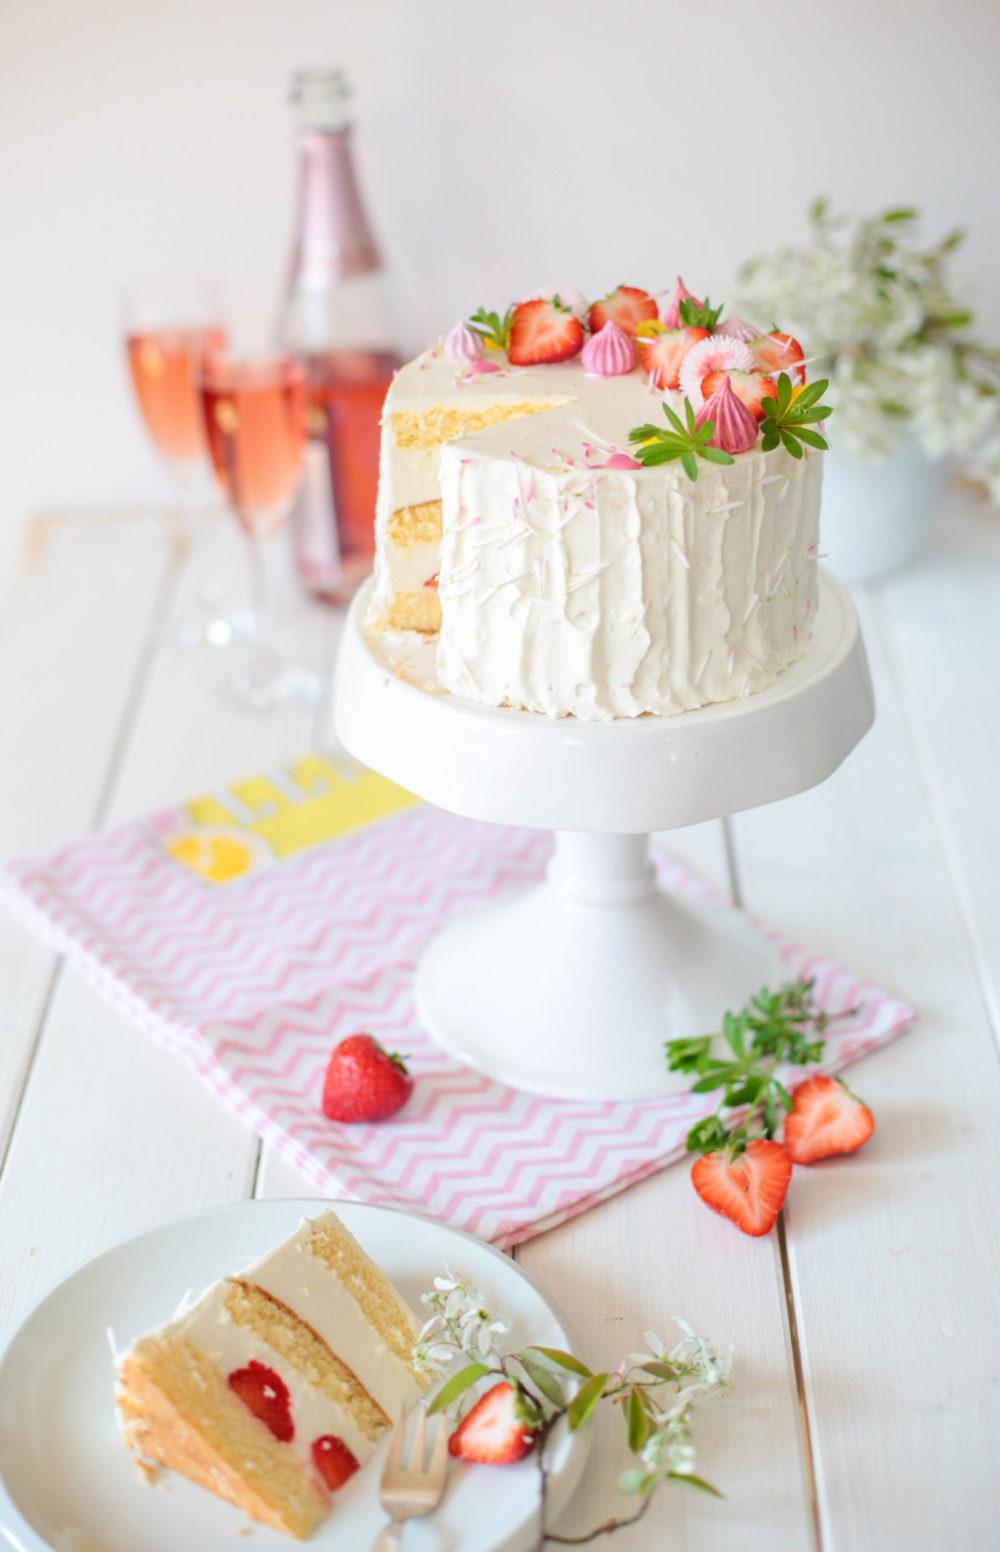 Edeka-unsere-heimat-torte-